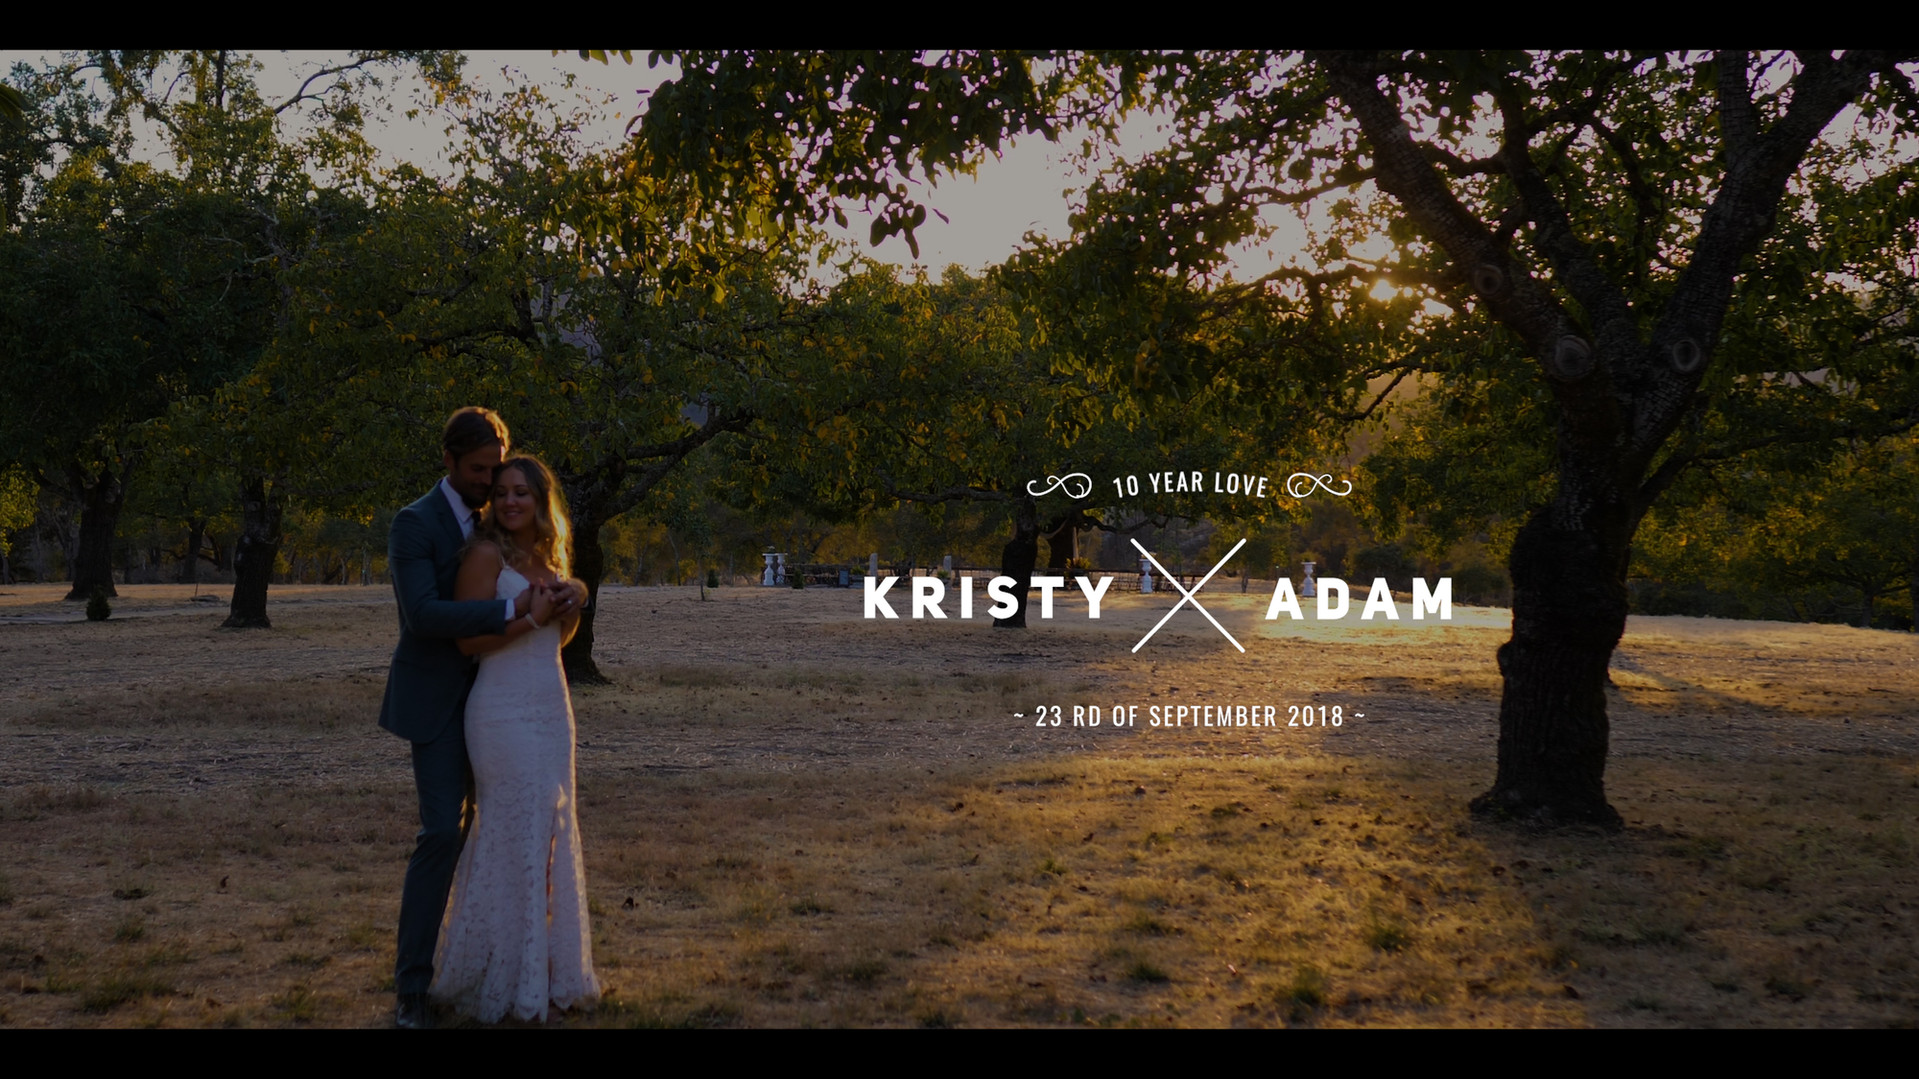 Kristy and Adam